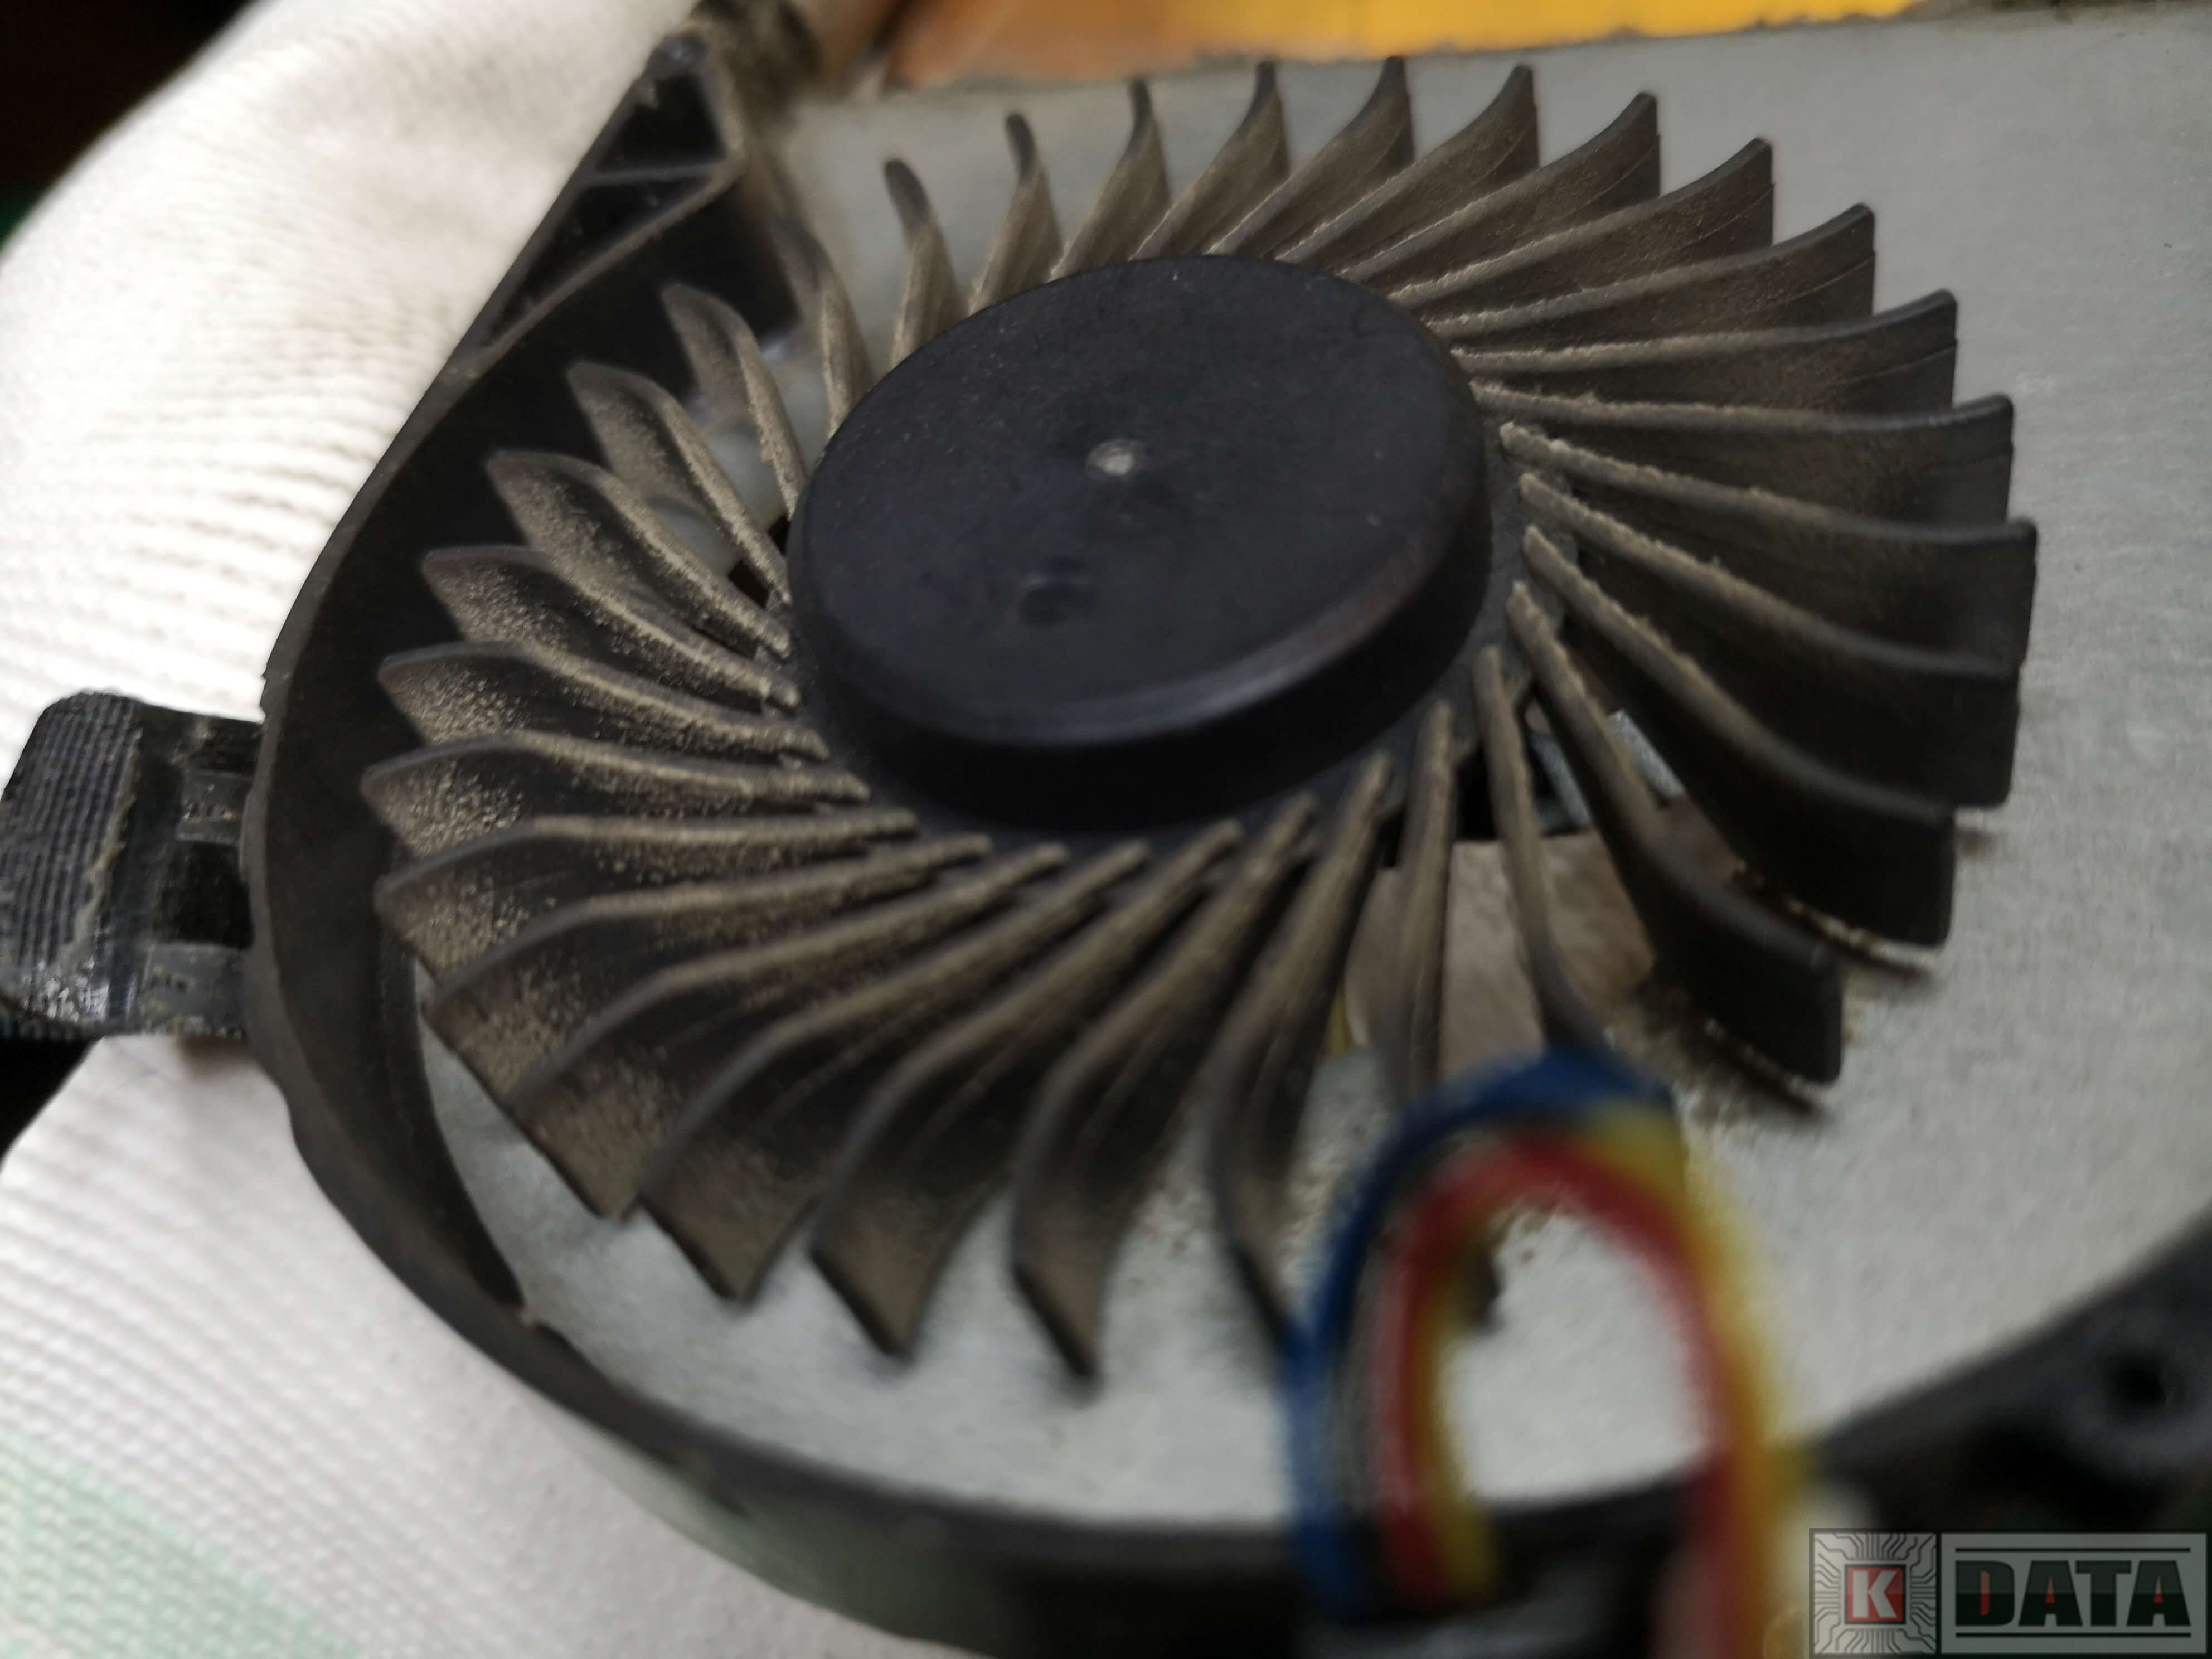 Lenovo IdeaPad Z570 brudny wentylator